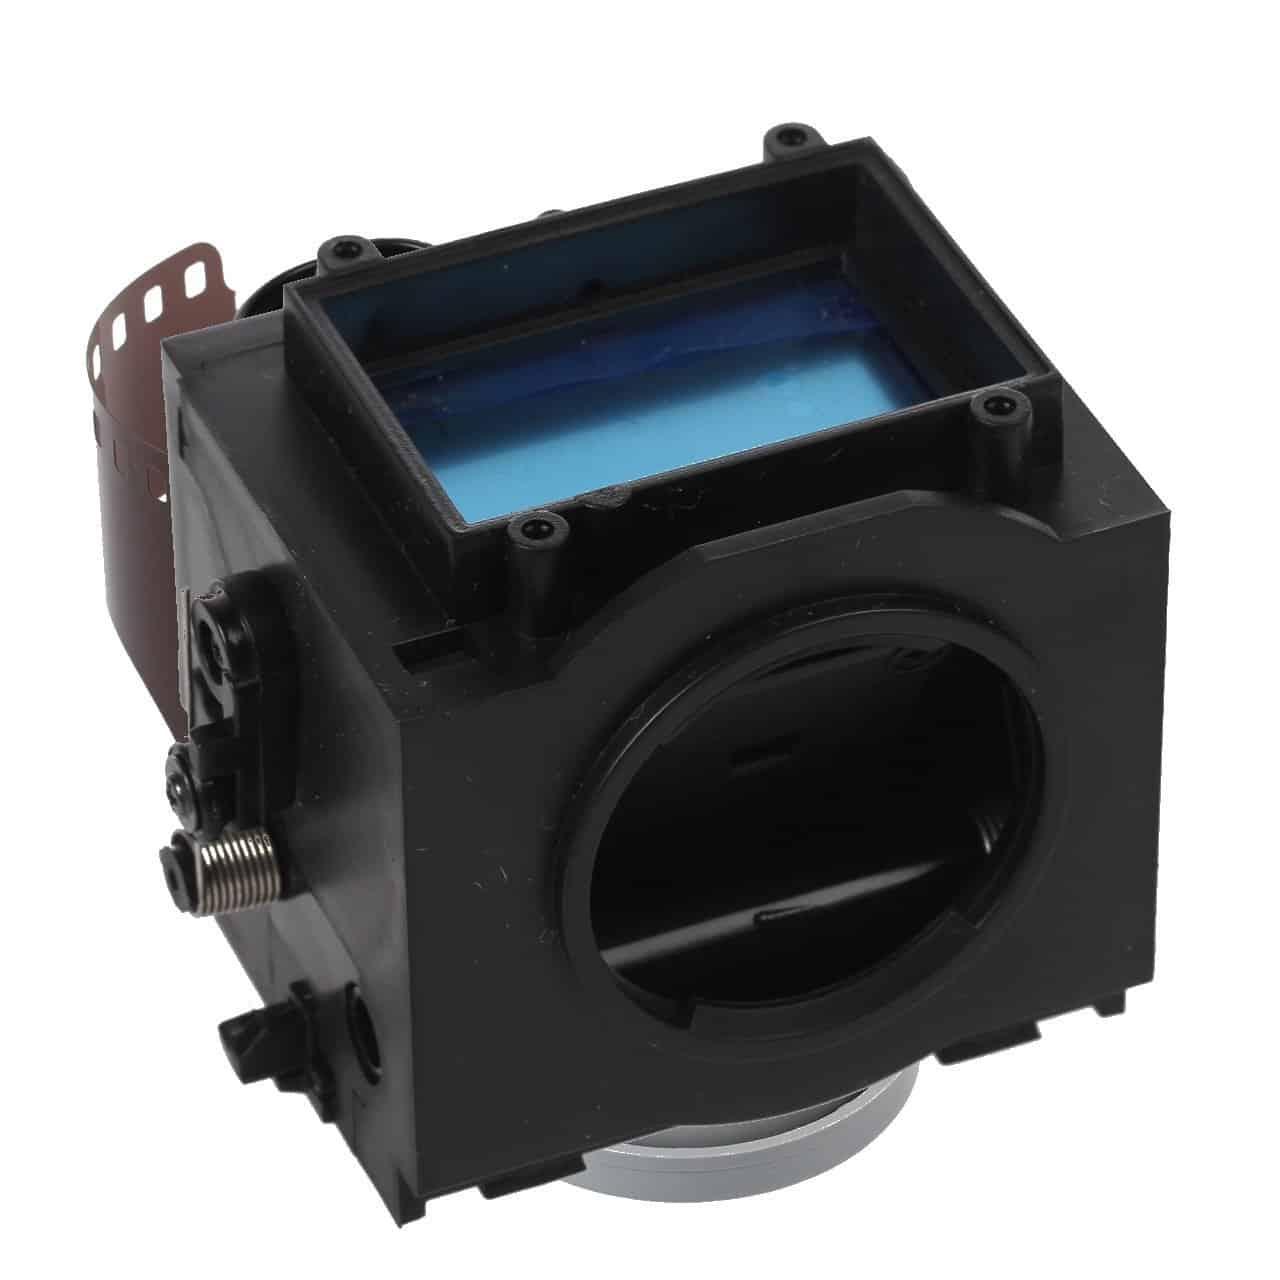 Lomography Konstruktor DIY 35mm SLR Camera Body